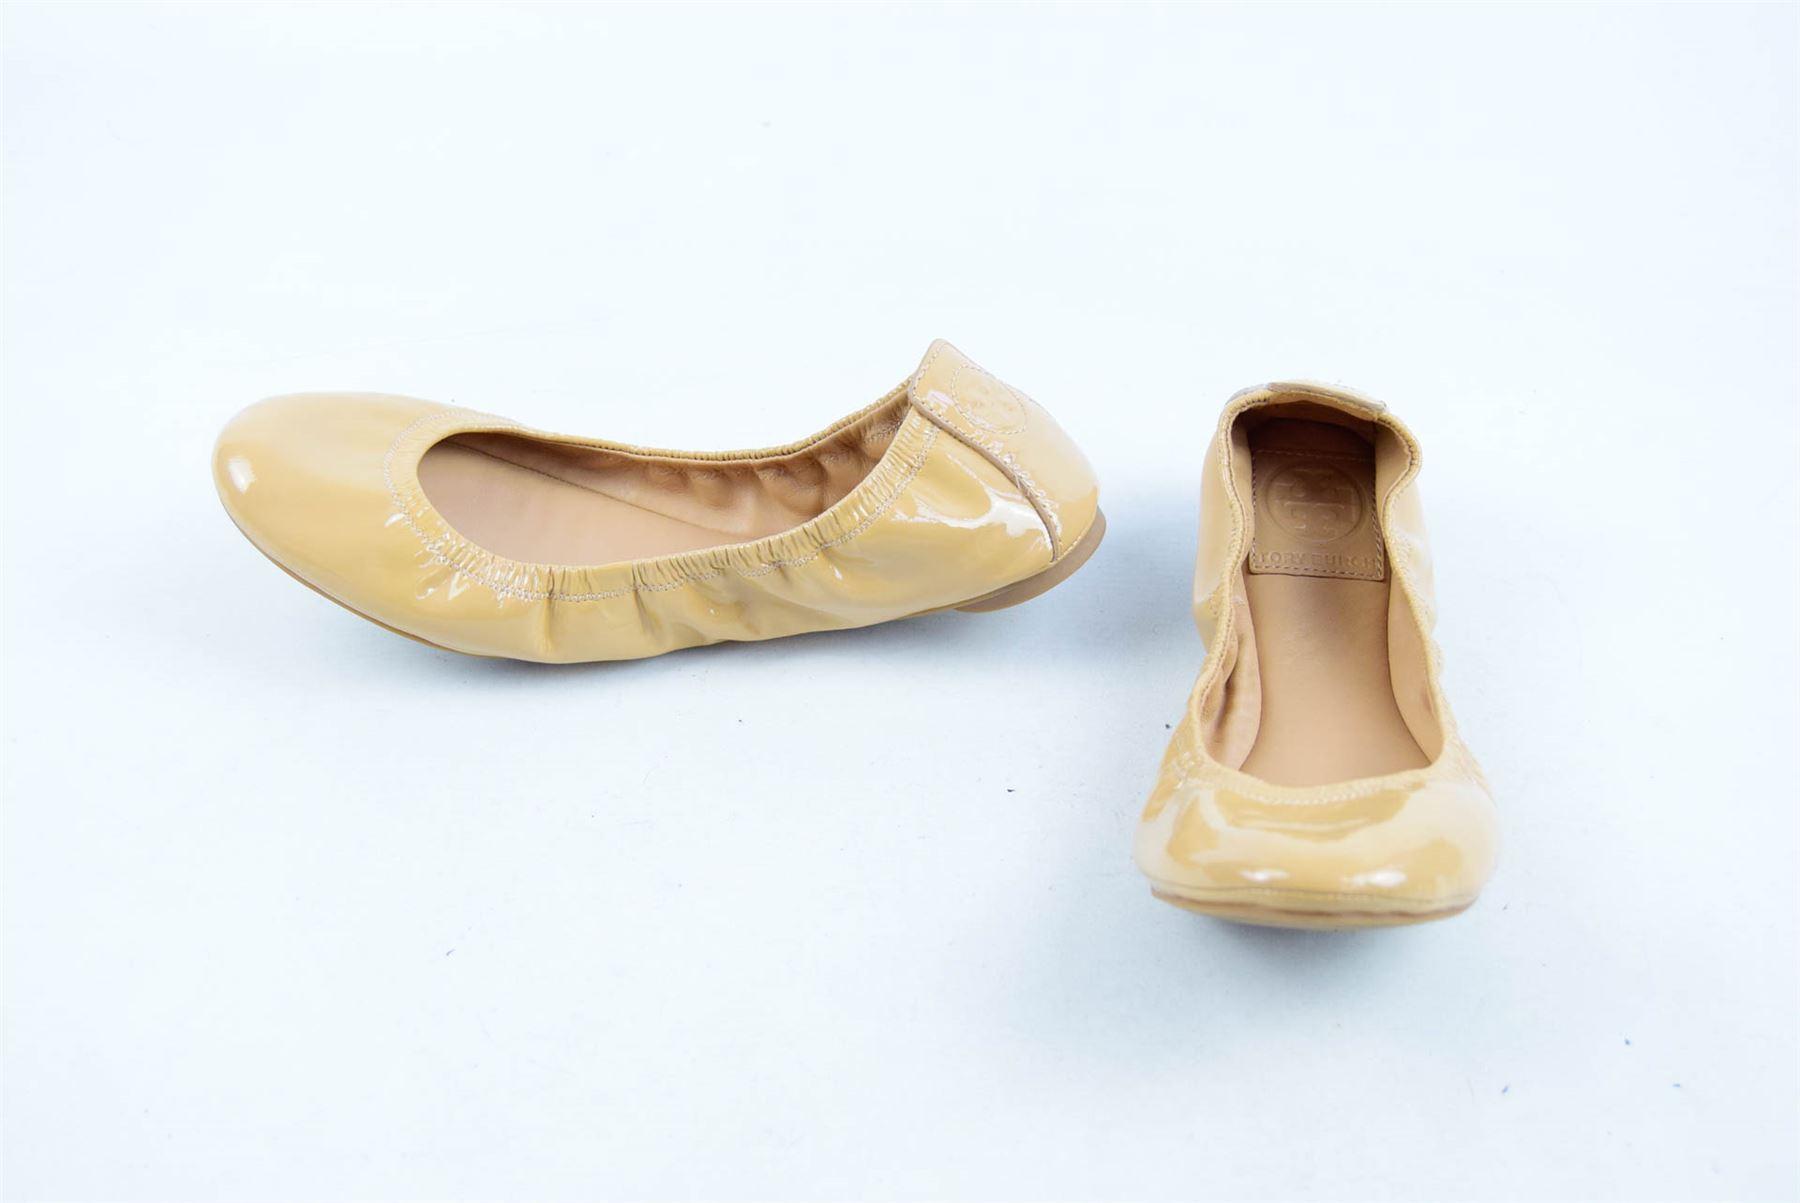 TORY BURCH Nude Patent Ballerina Shoes, UK 5 US 7.5 EU 38